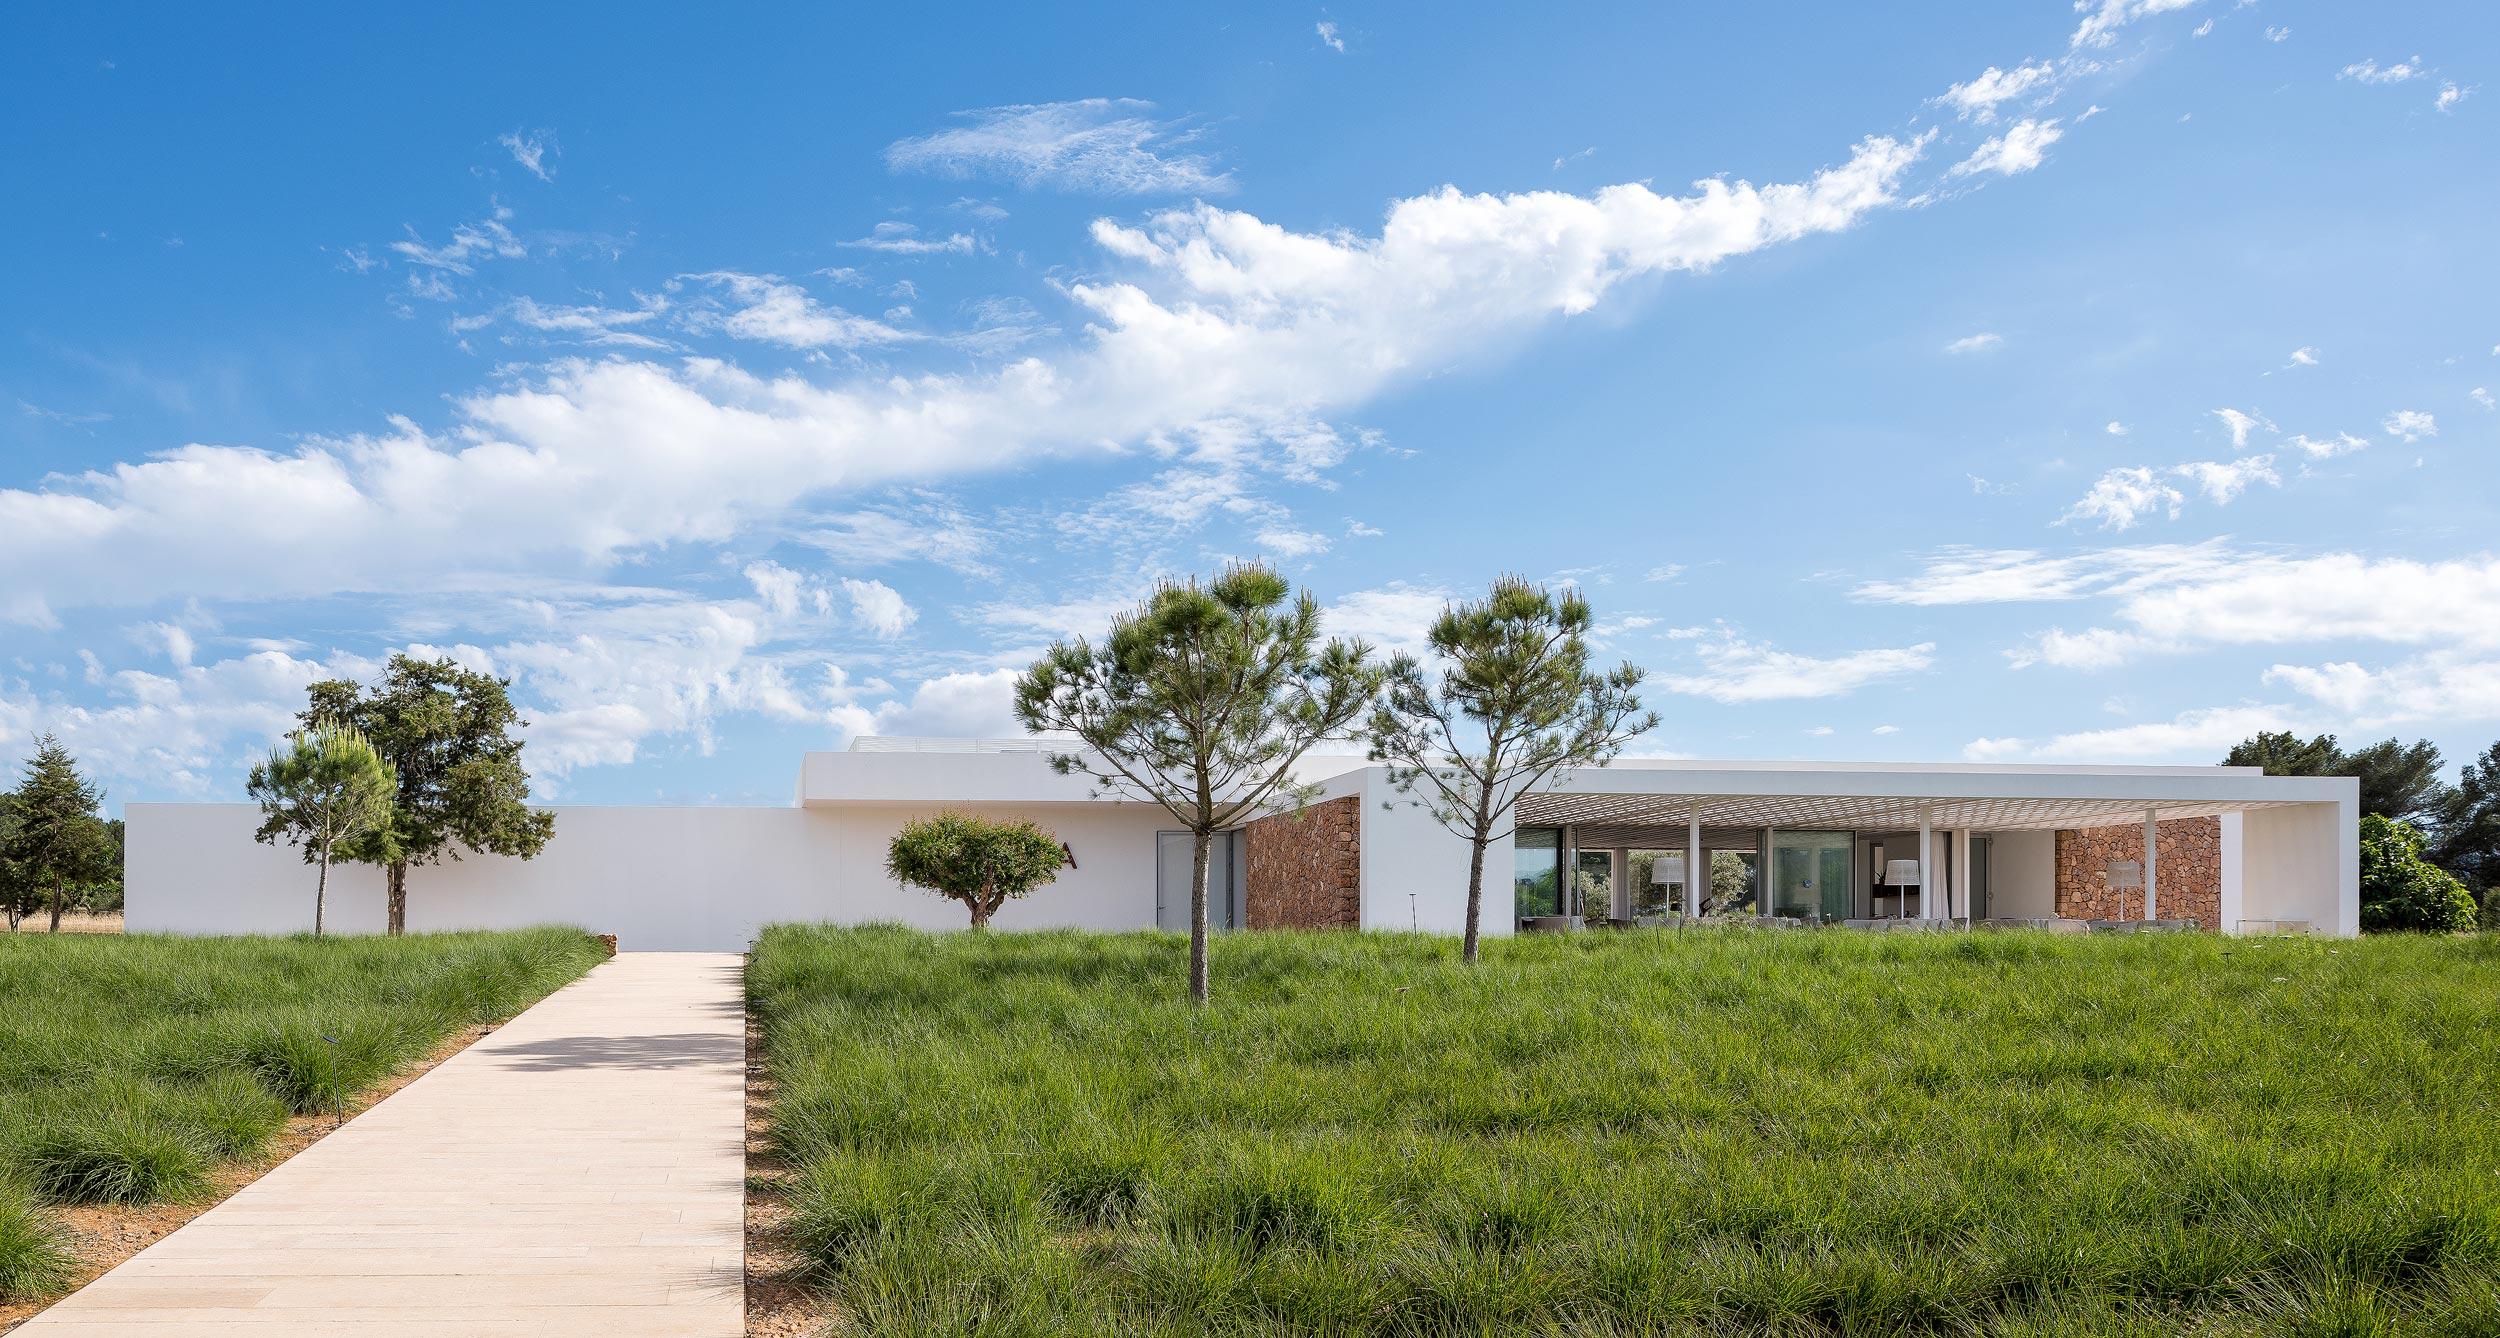 Salvia Ibiza, restaurant photography from Chiel de Nooyer, interior photographer